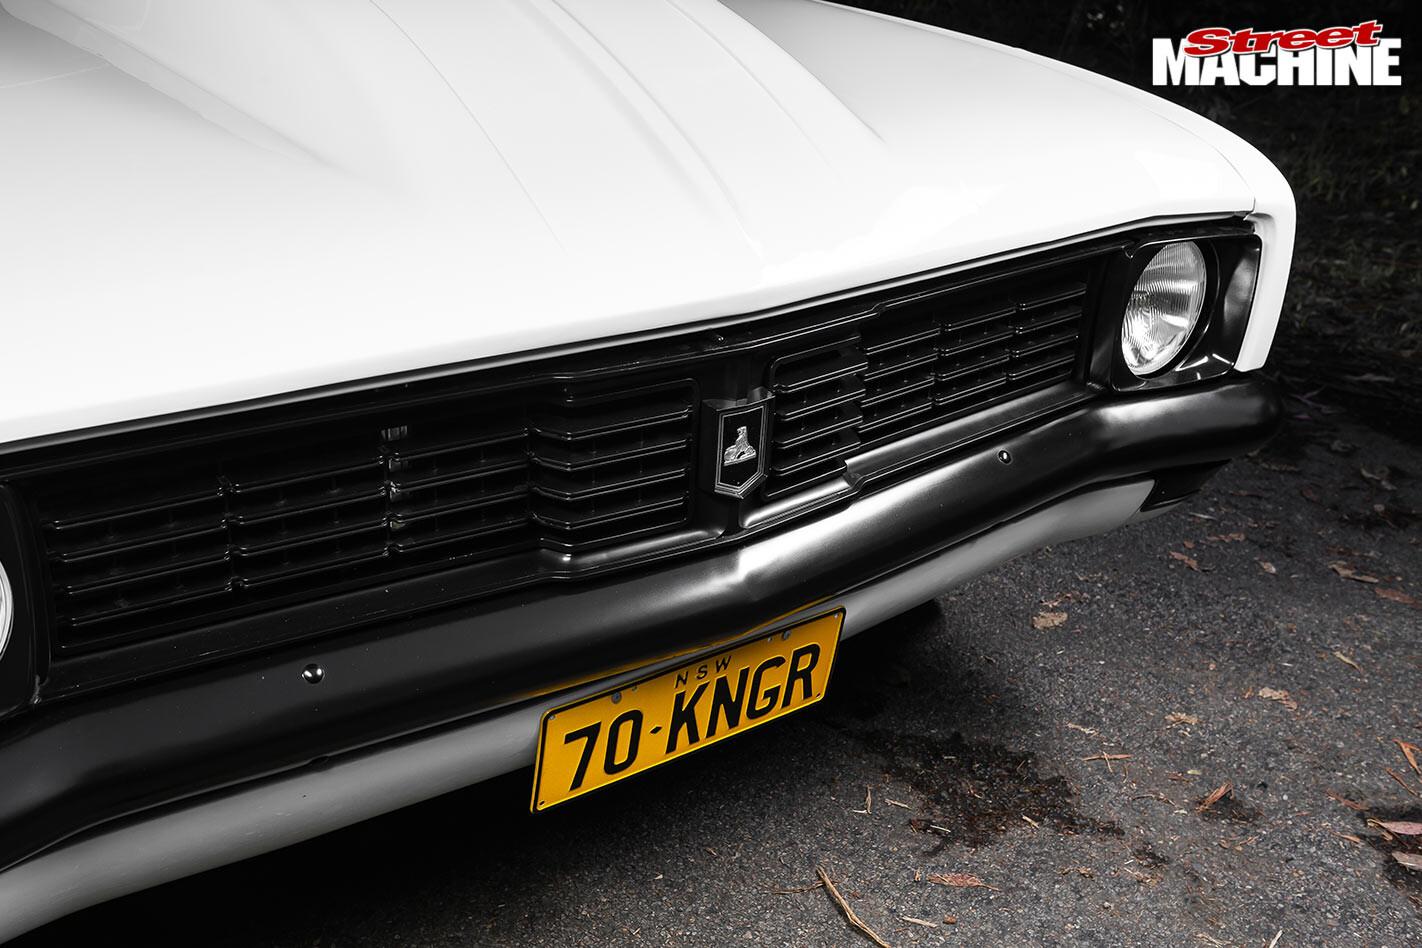 Holden HT Kingswood front